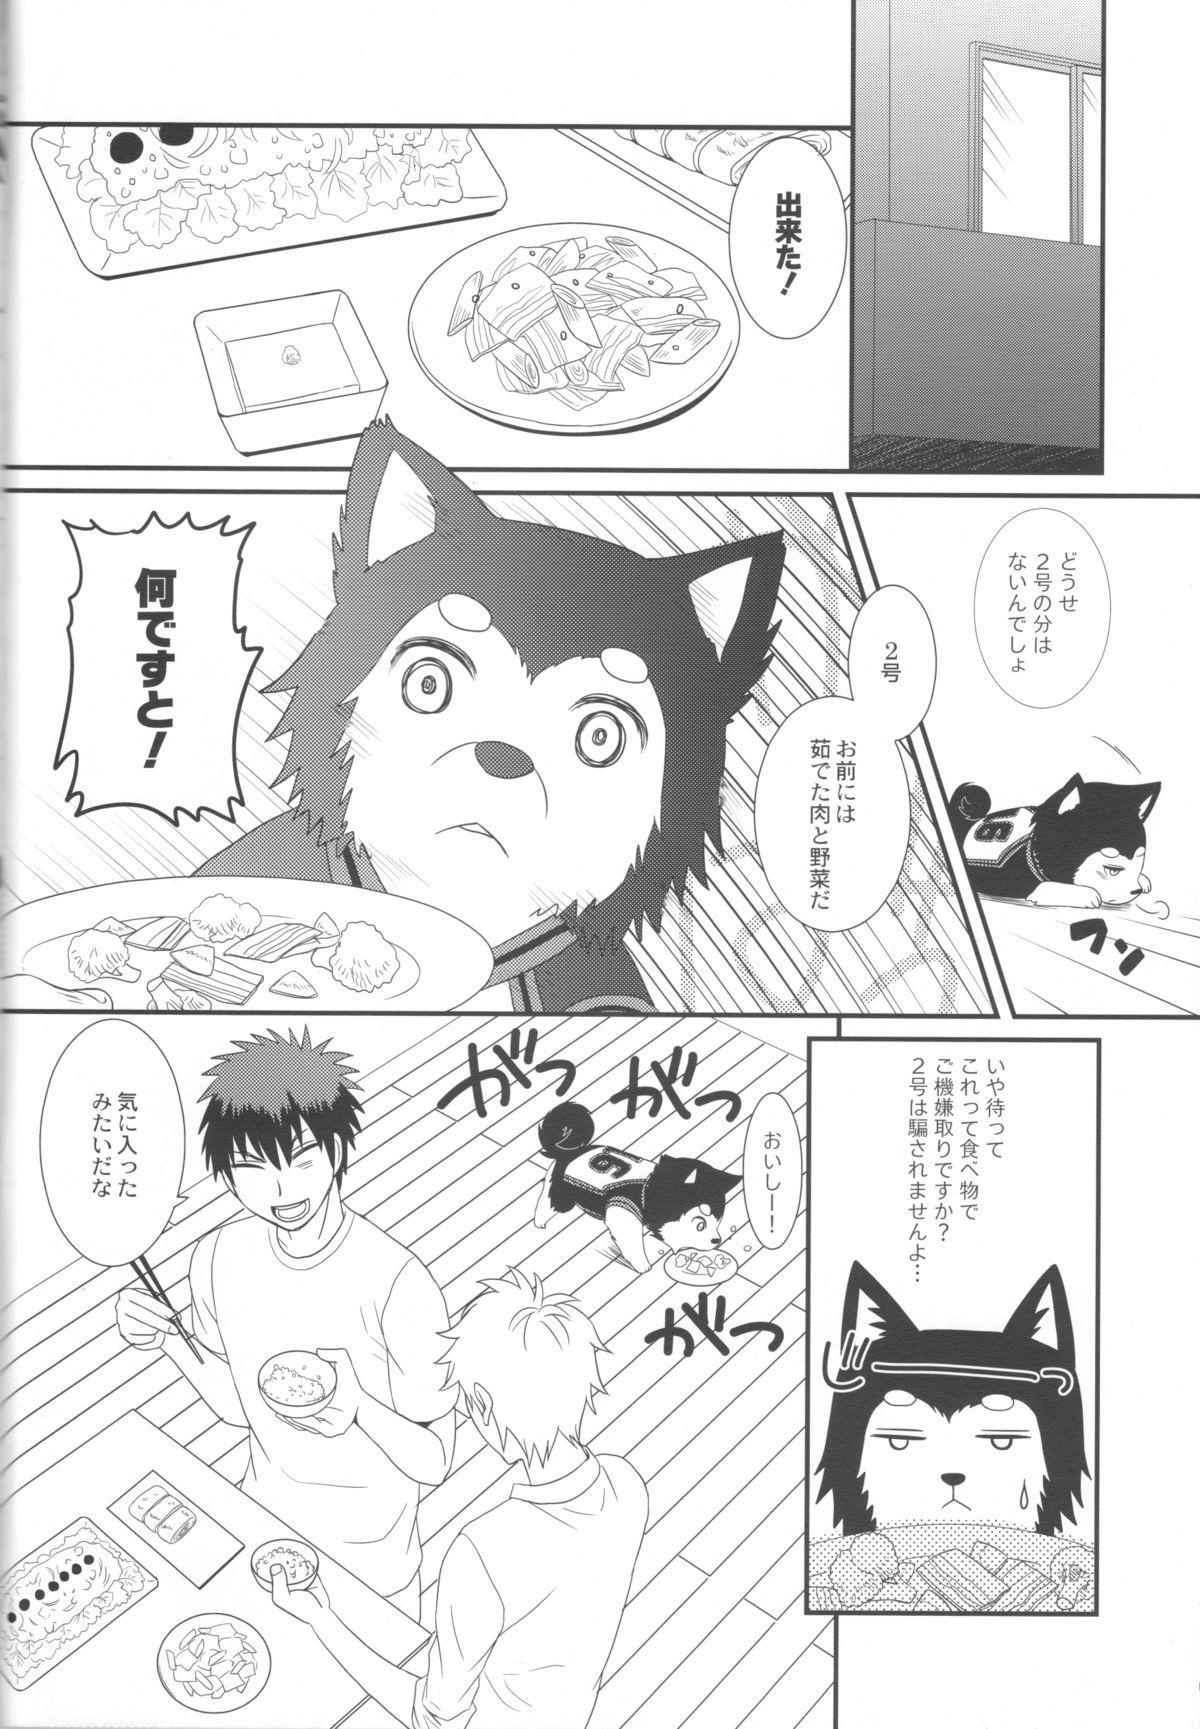 Kuroko to Kagami to Tokidoki Nigou to 6